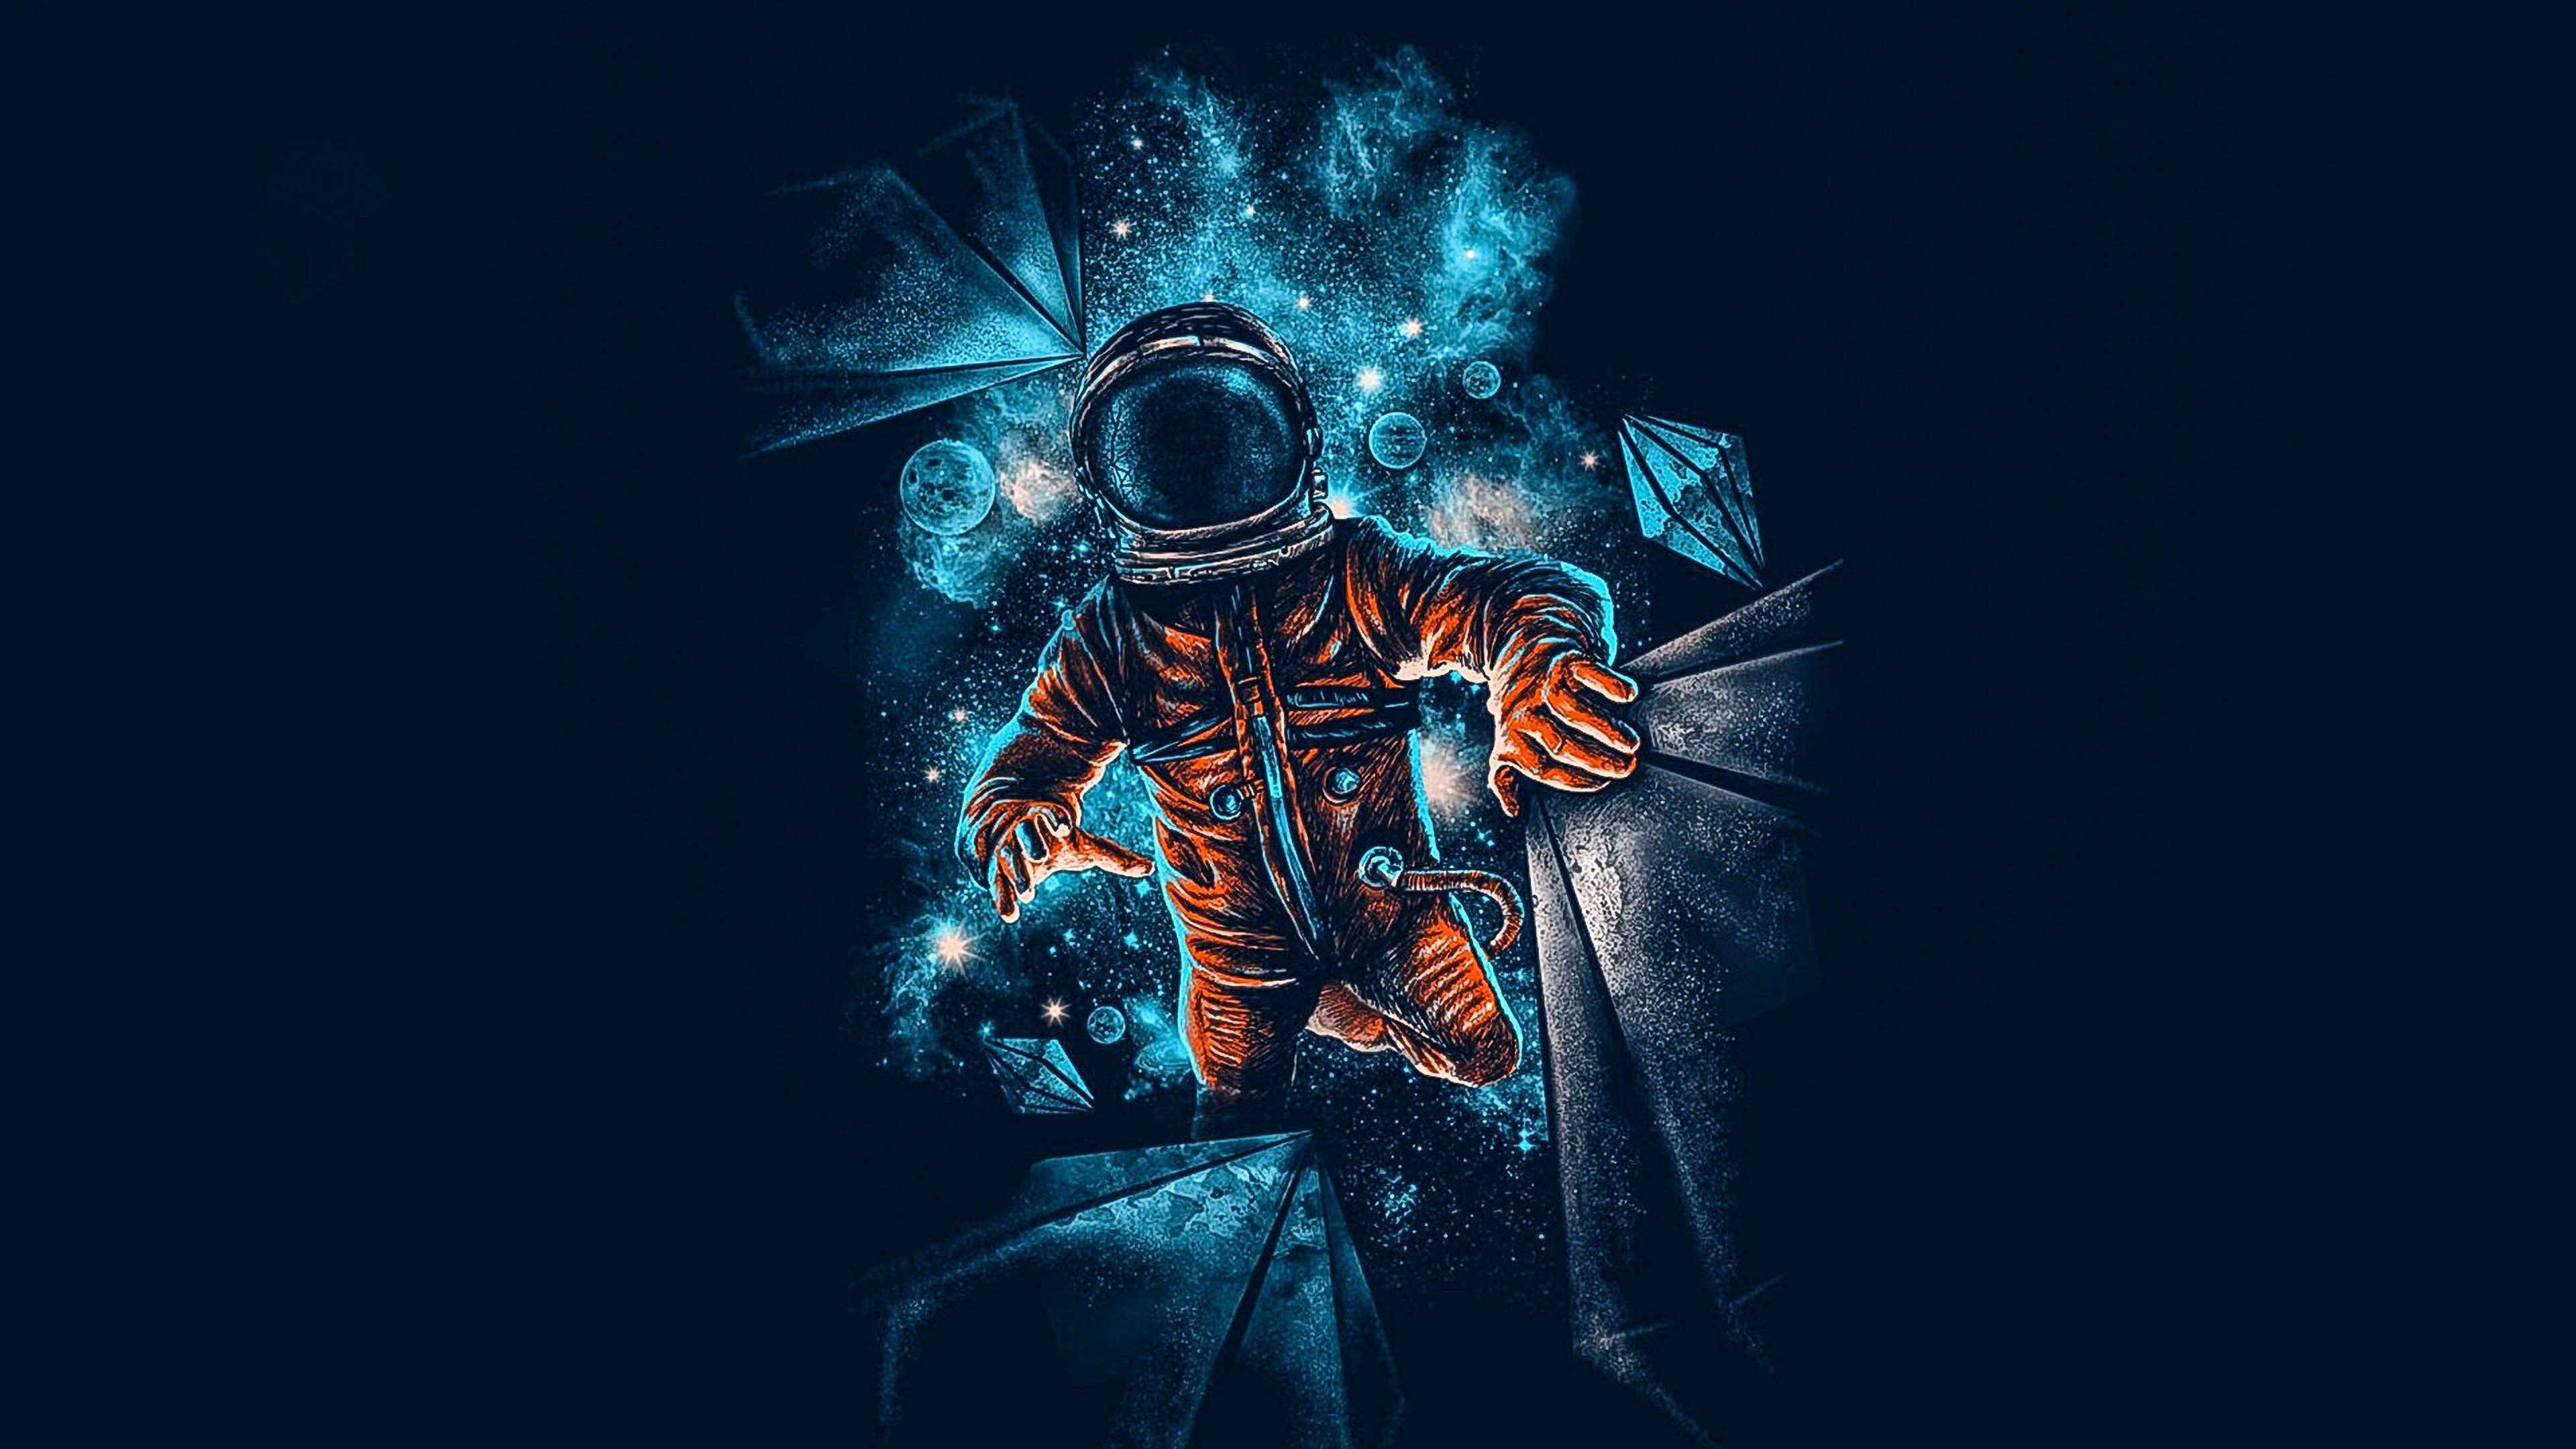 28 Spaceman Wallpapers On Wallpapersafari